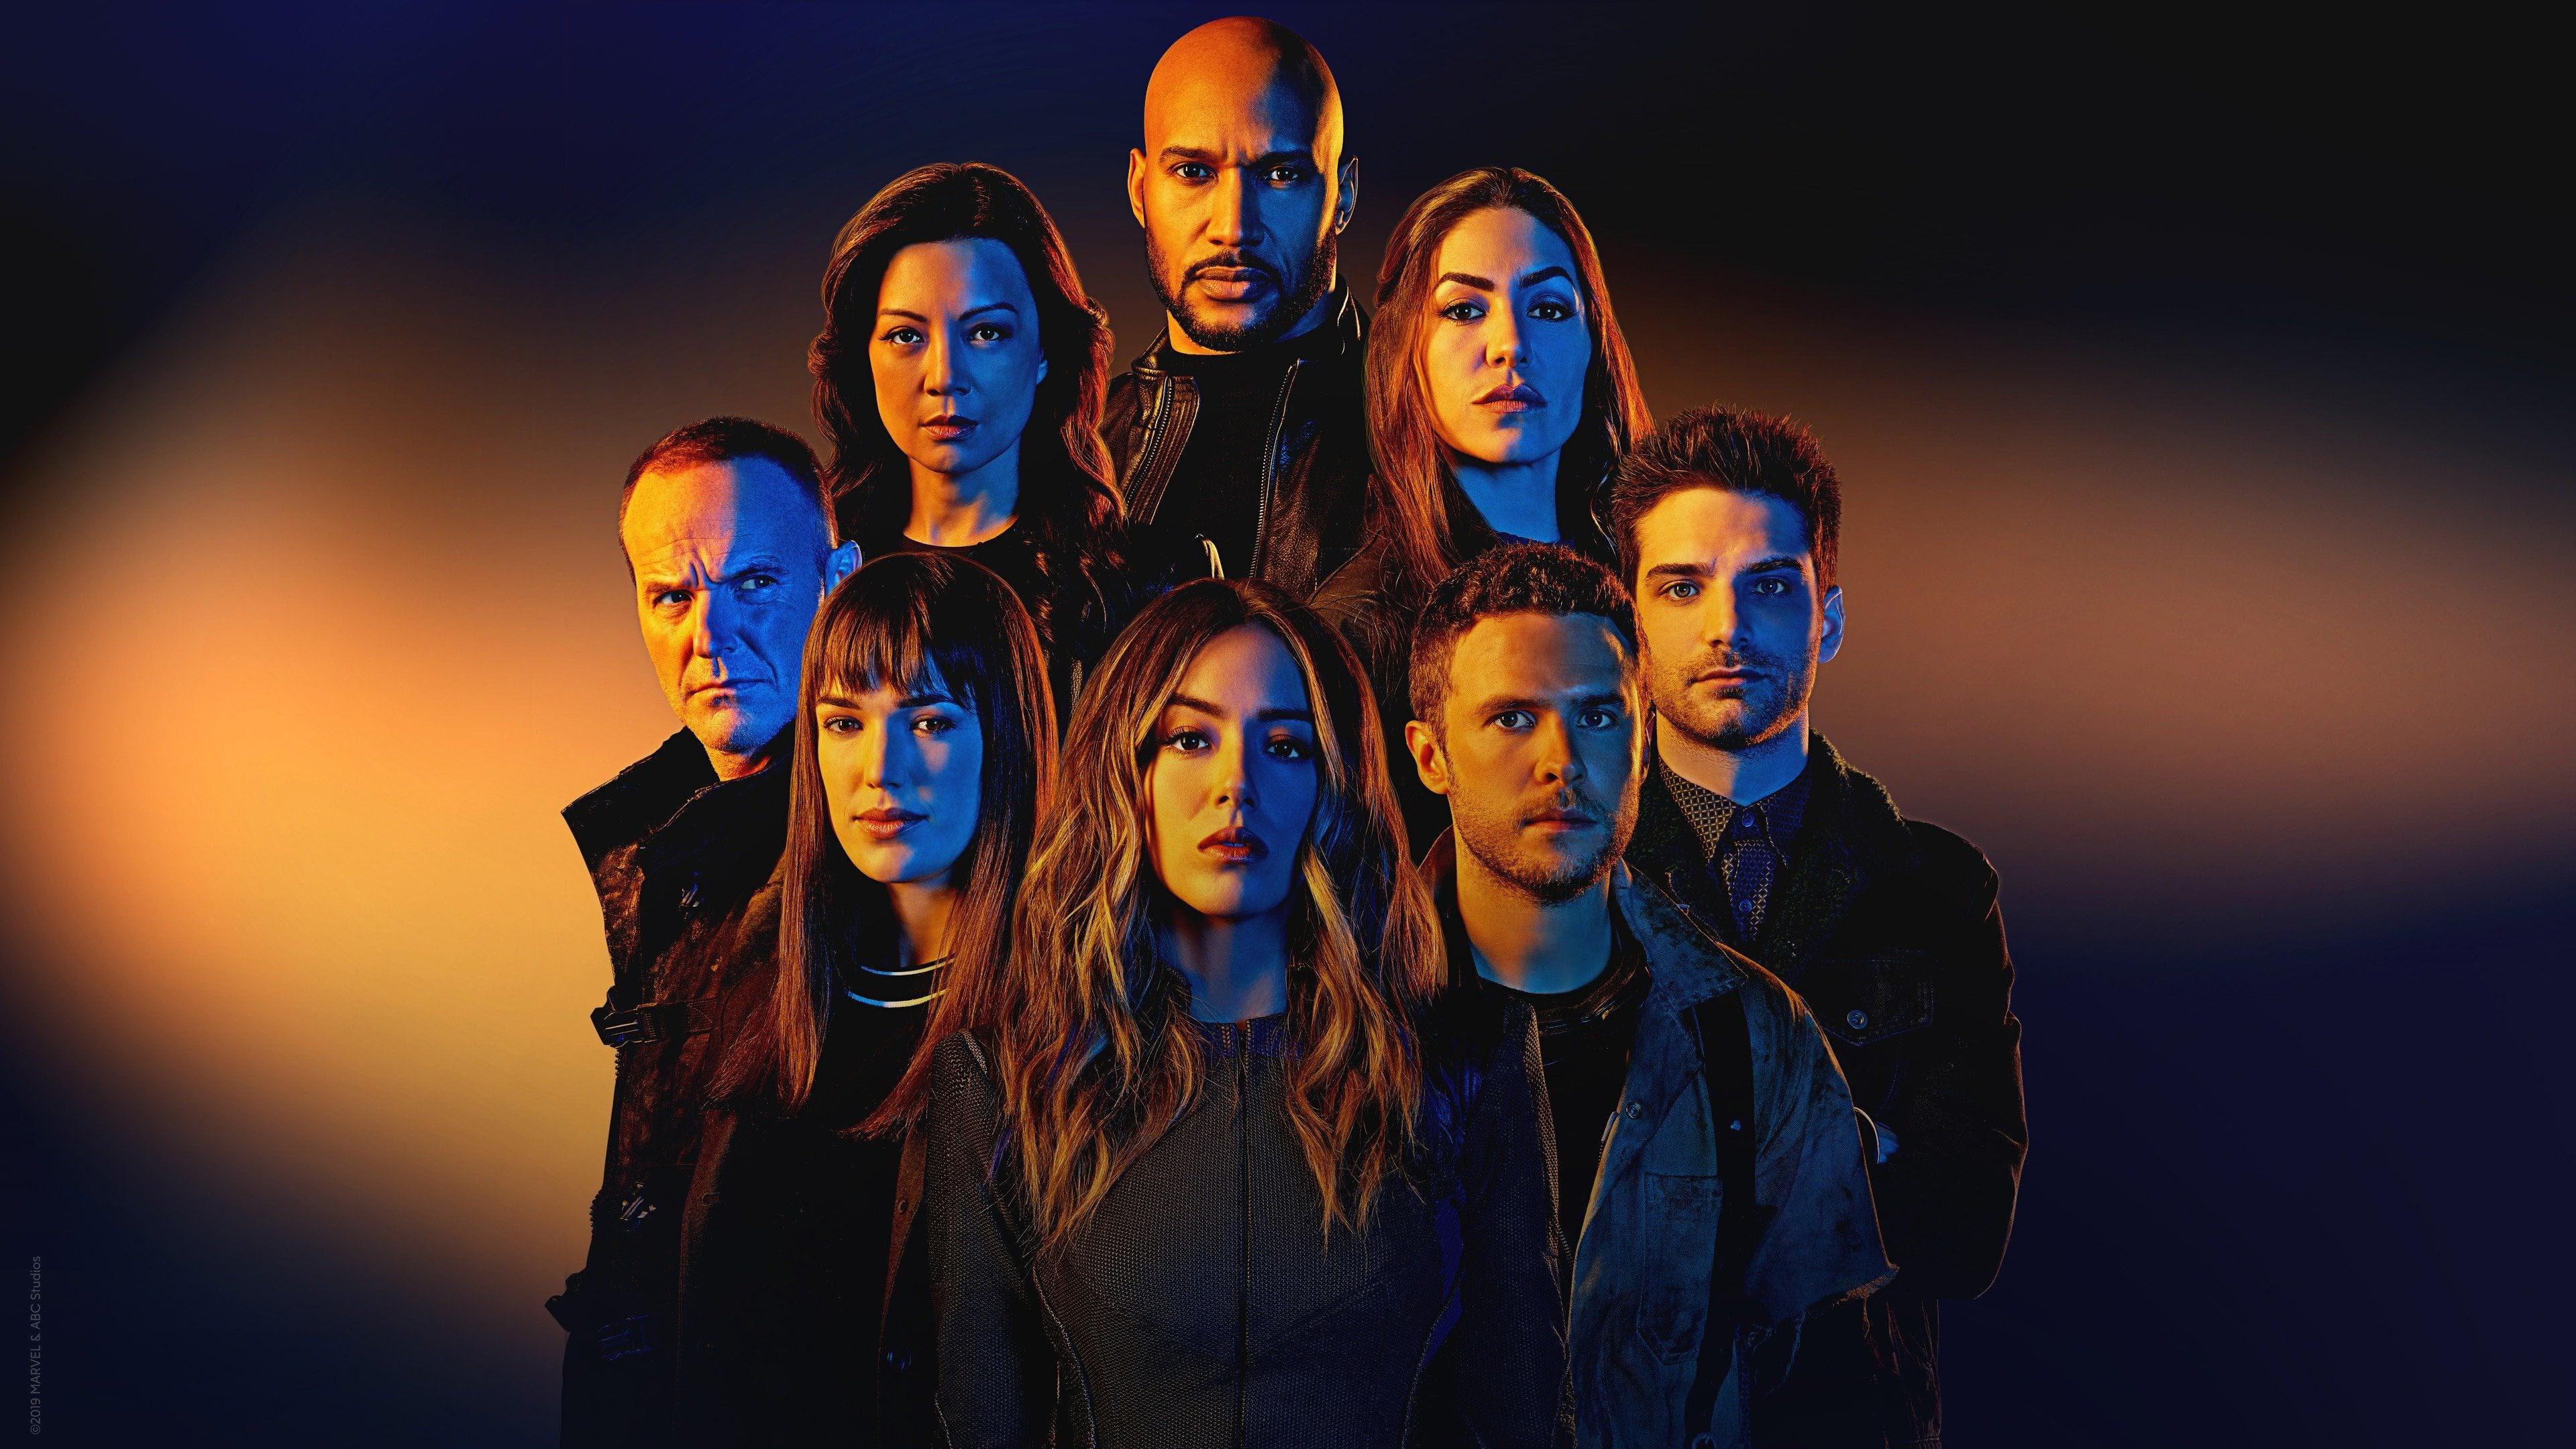 Marvel Agents Of Shield Season 7 4k Wallpapers Wallpapers Hd